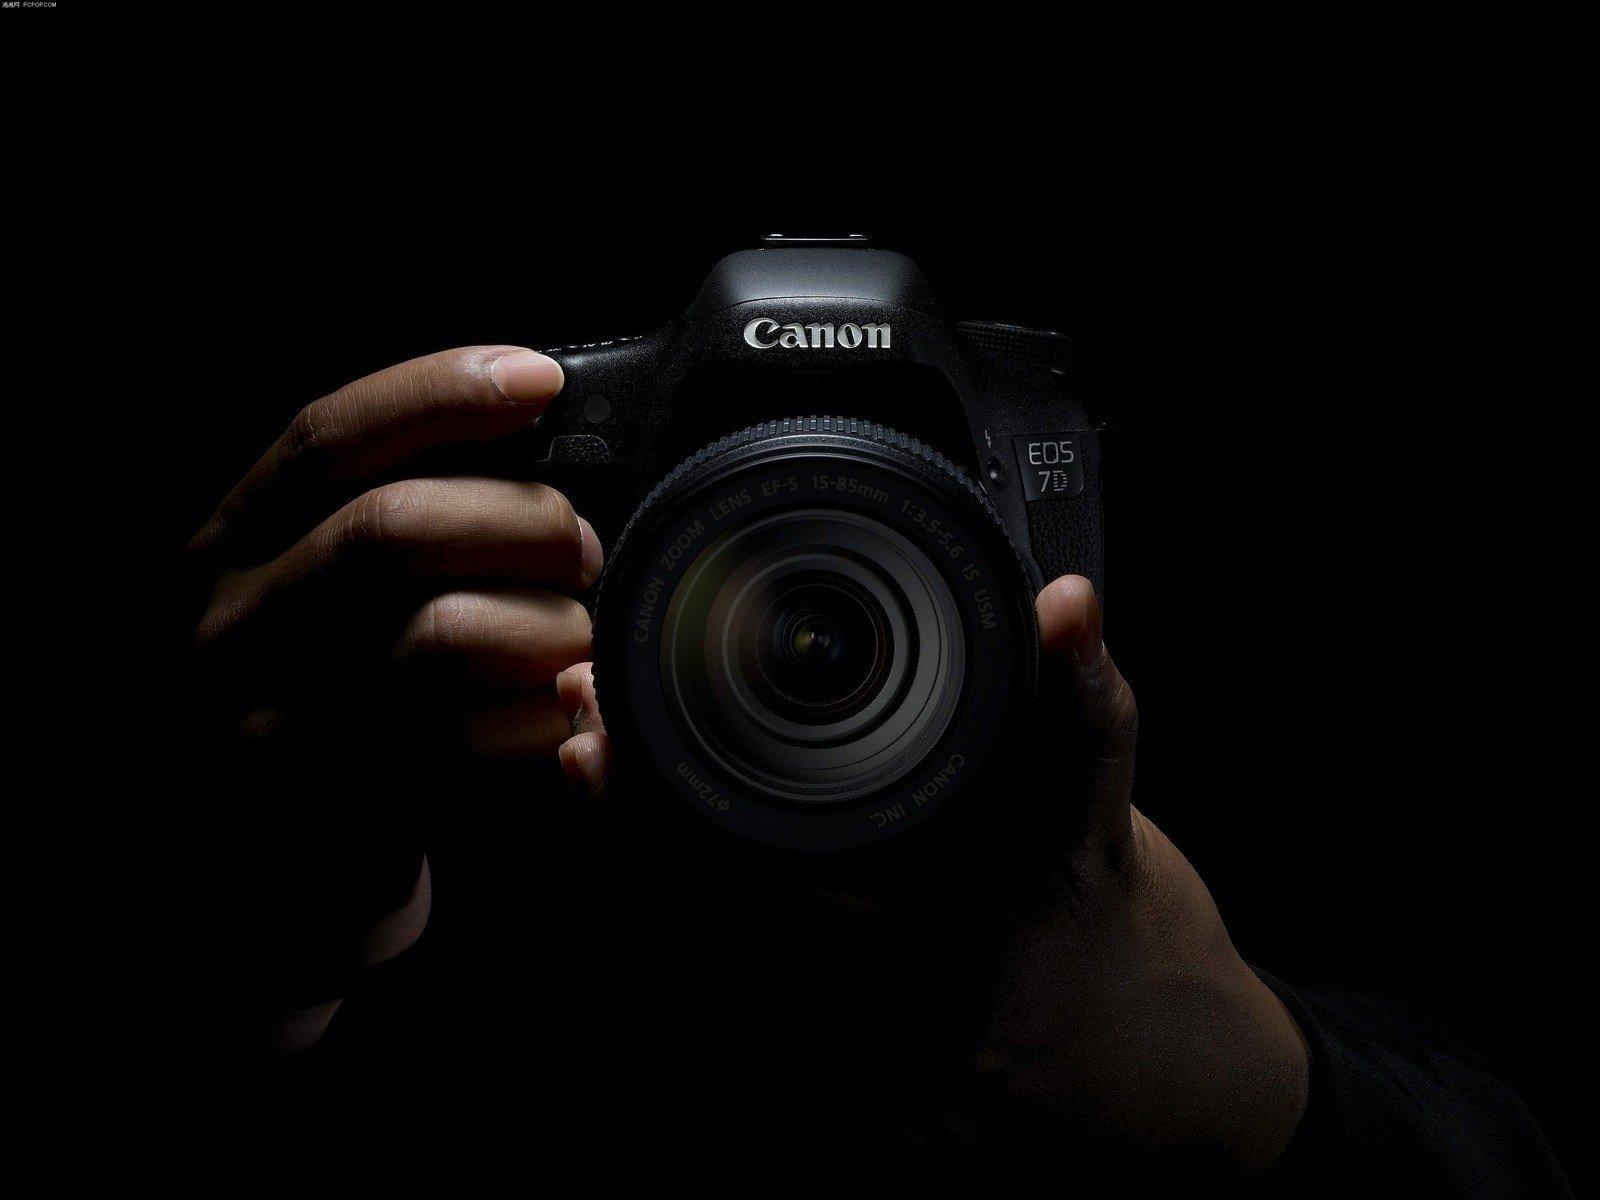 Appareil photo fond d 39 cran and arri re plan 1600x1200 for Ecran appareil photo canon